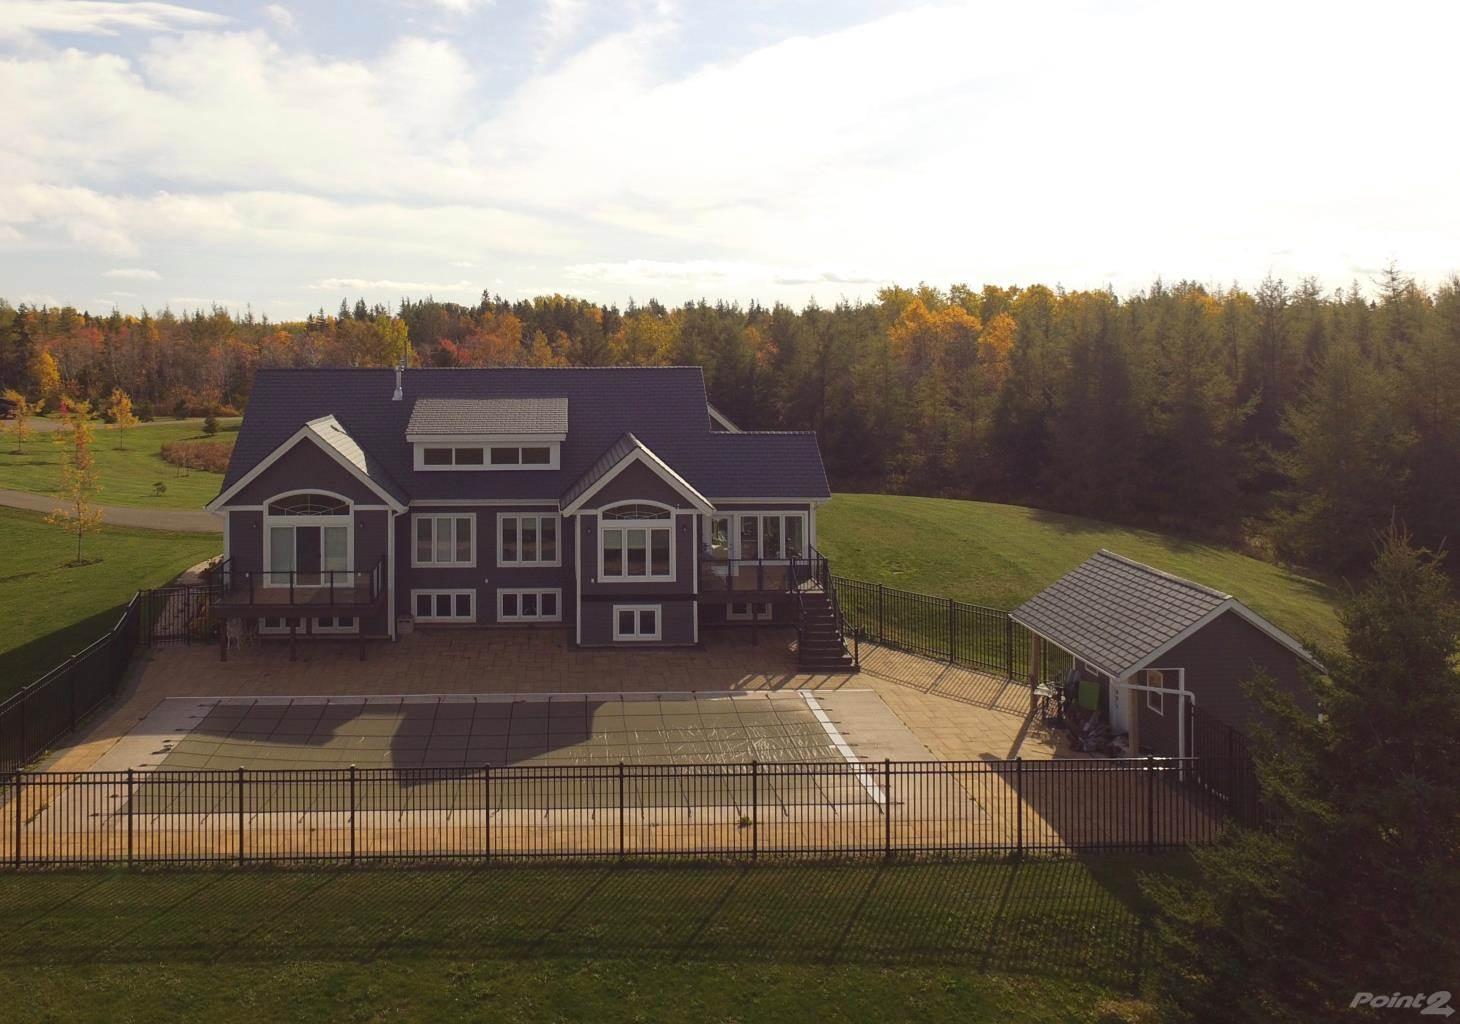 Donaldston Rd in Donaldston - House For Sale : MLS# null Photo 3